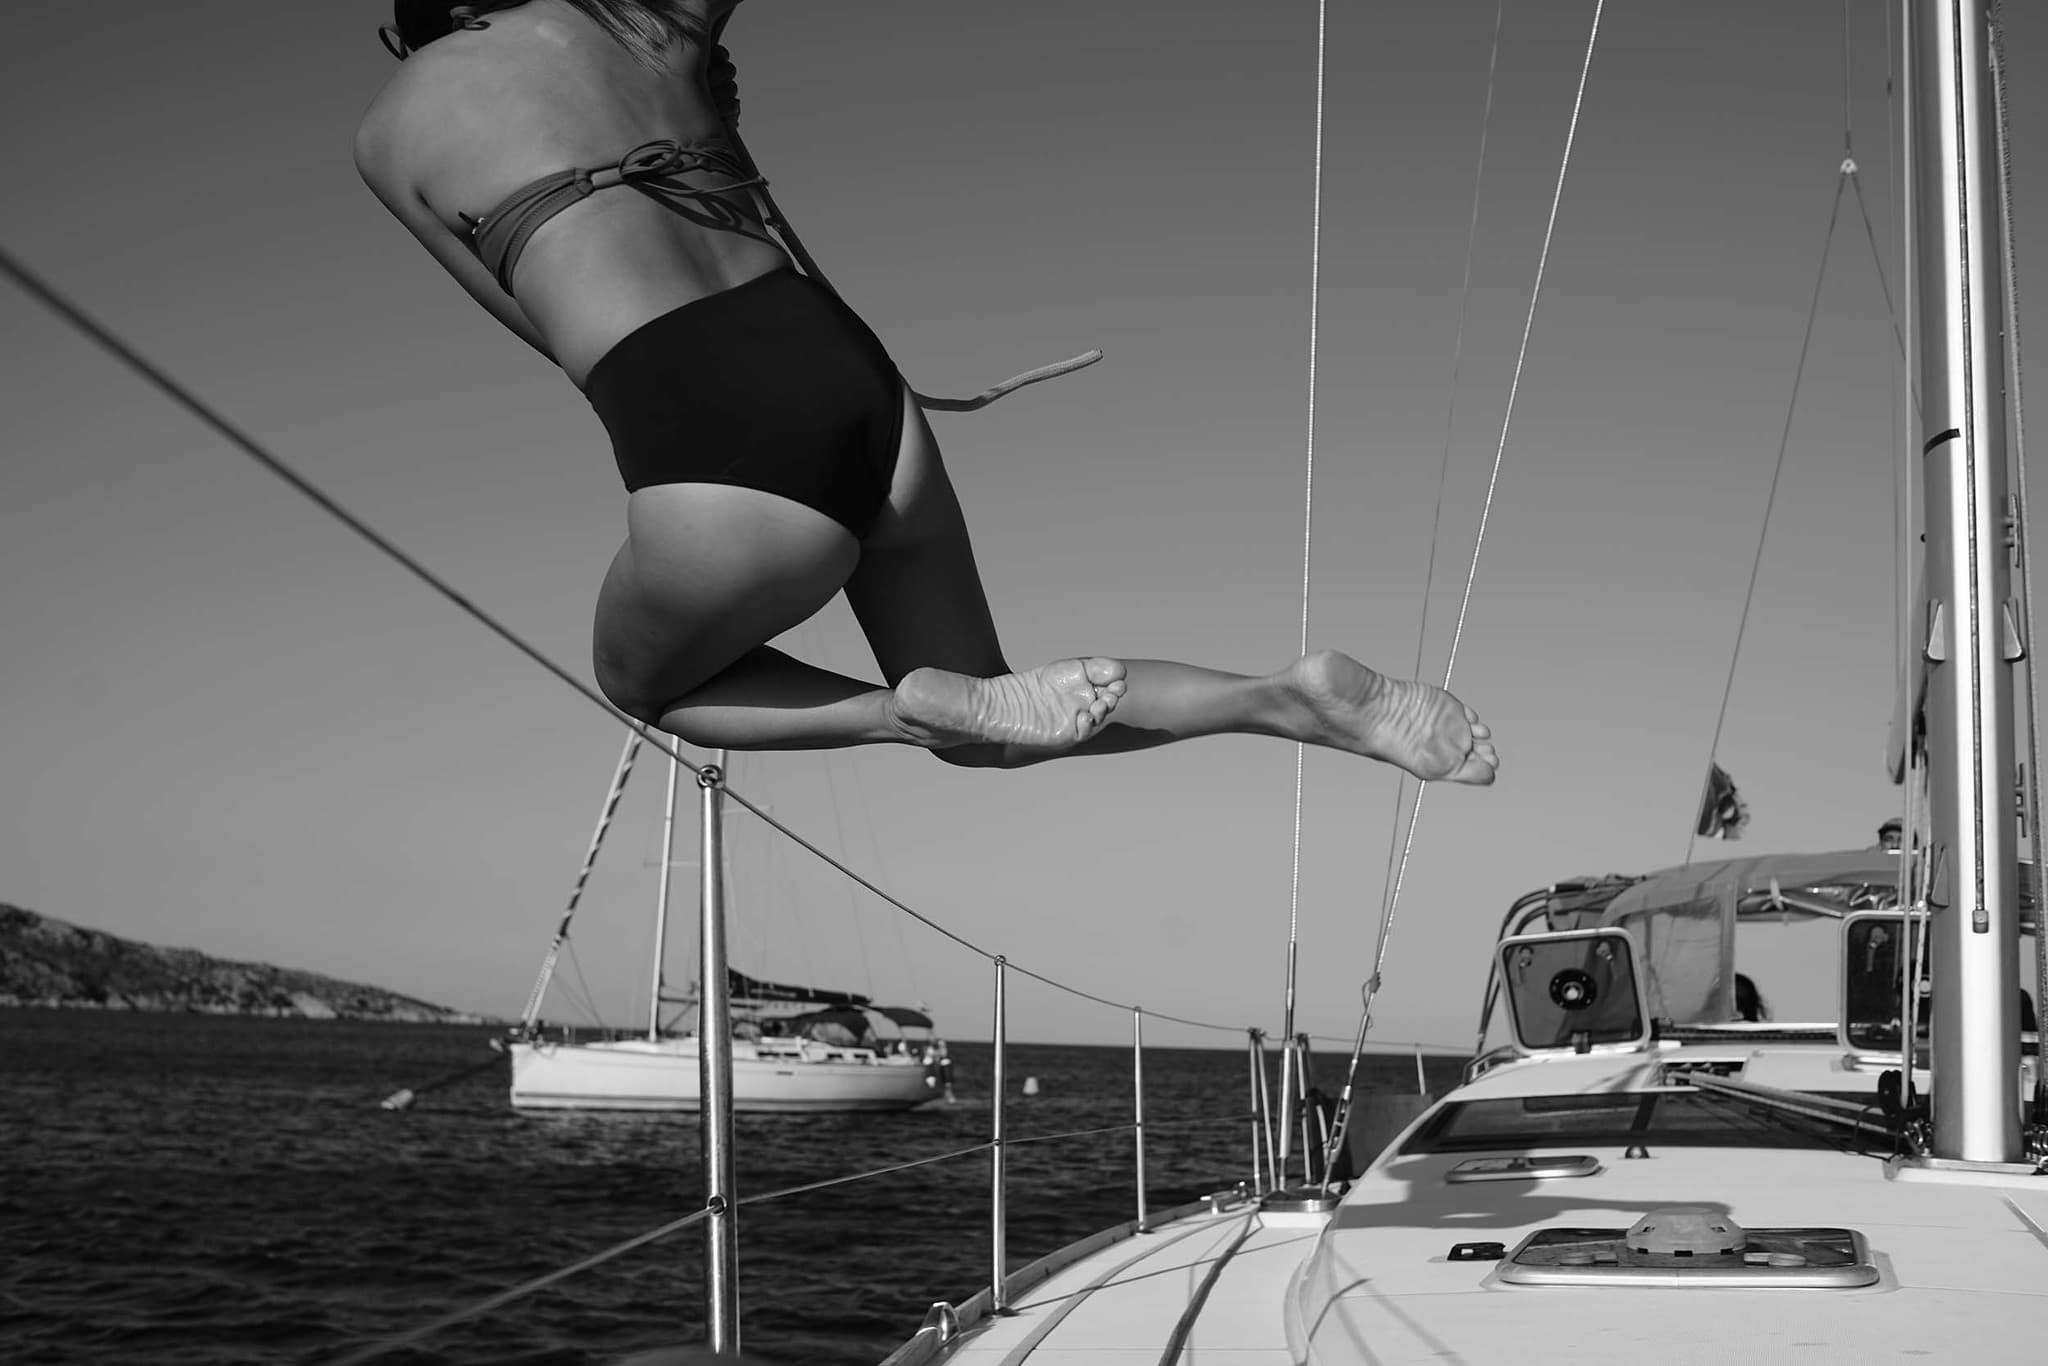 sailing-collective__dsc5162